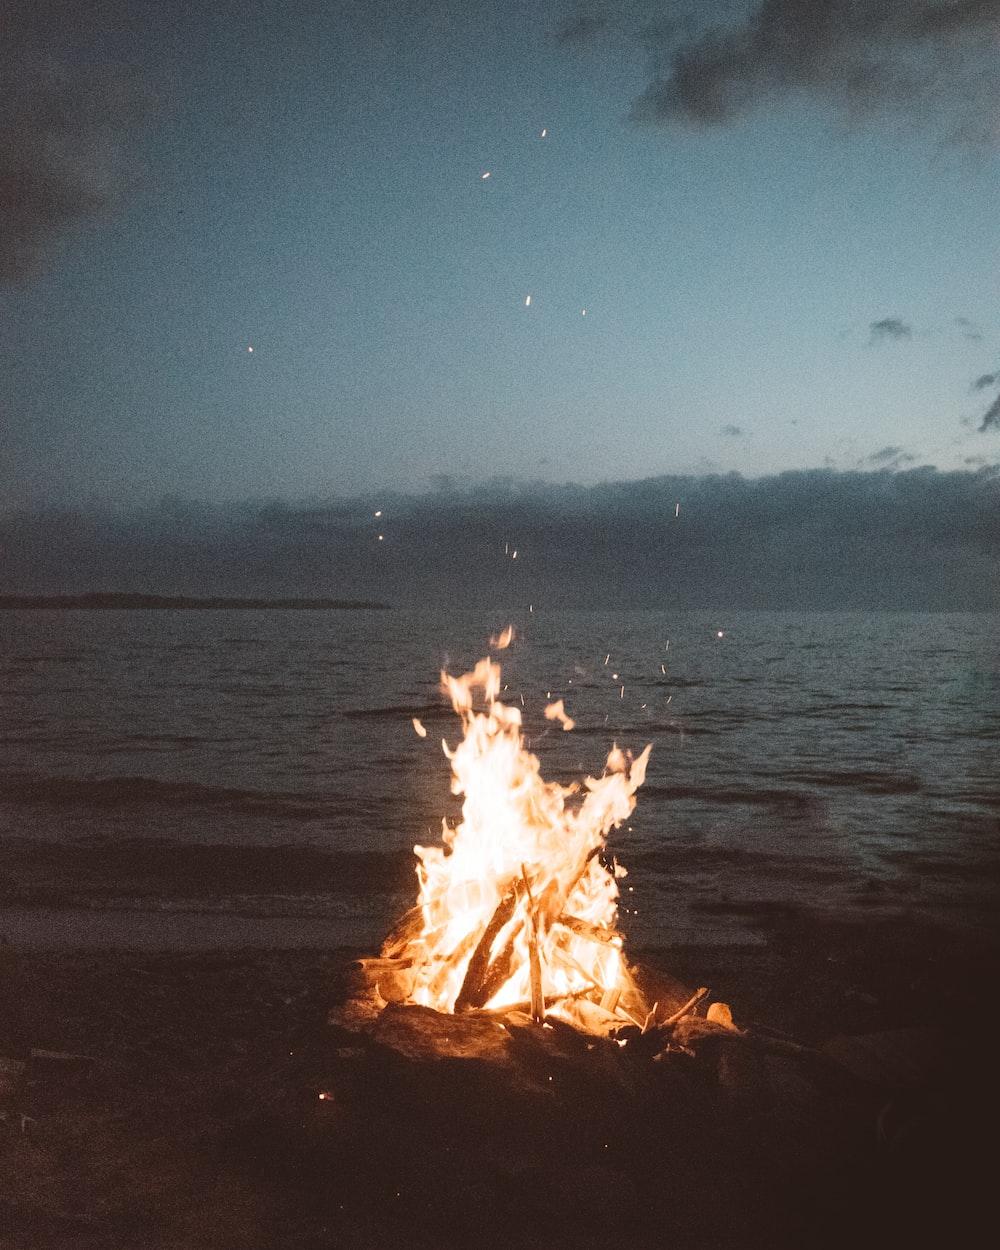 Fire near the sea